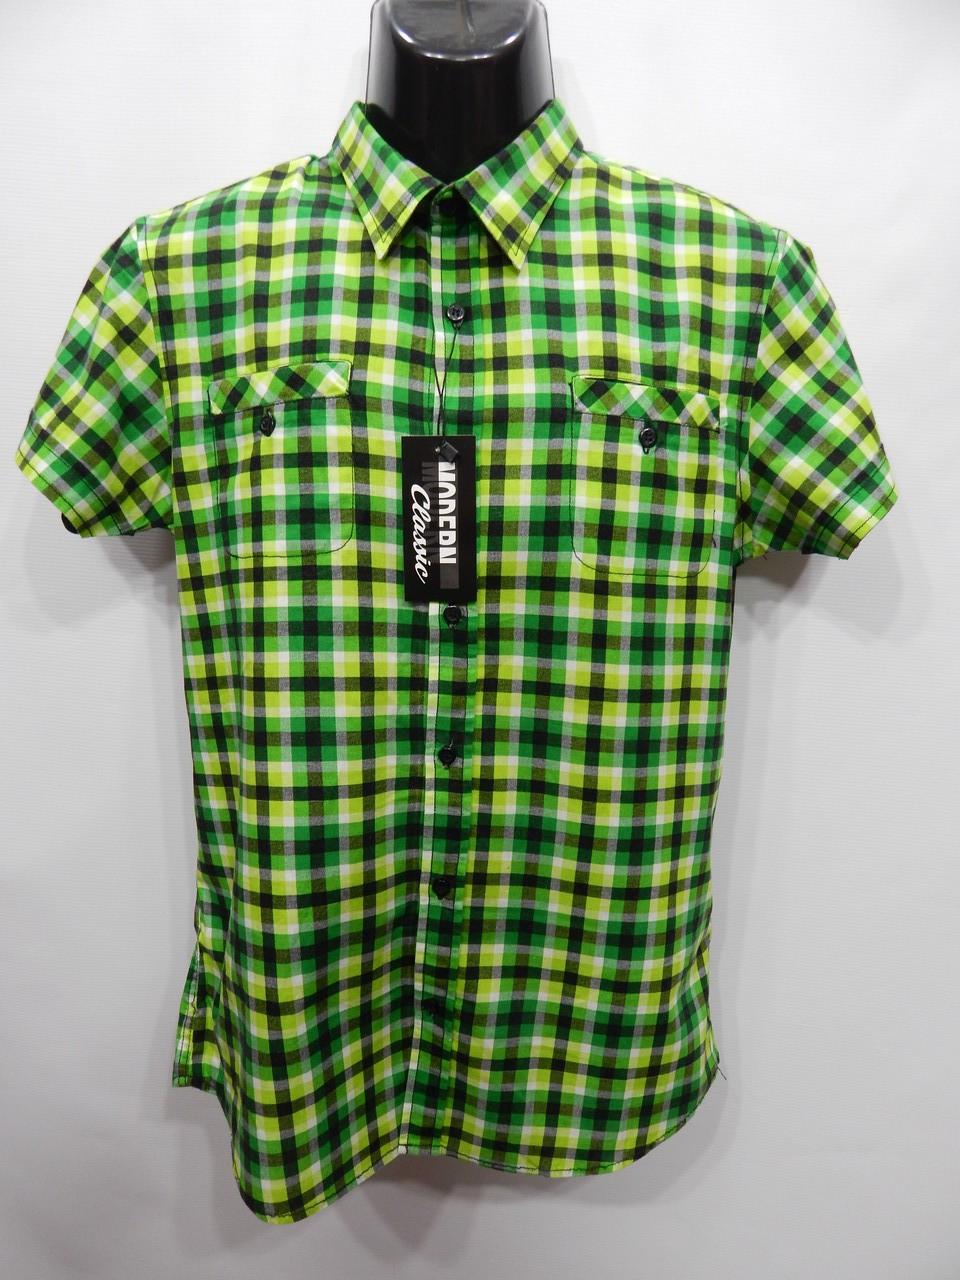 Мужская рубашка с коротким рукавом Fishbone оригинал (064КР) р.48